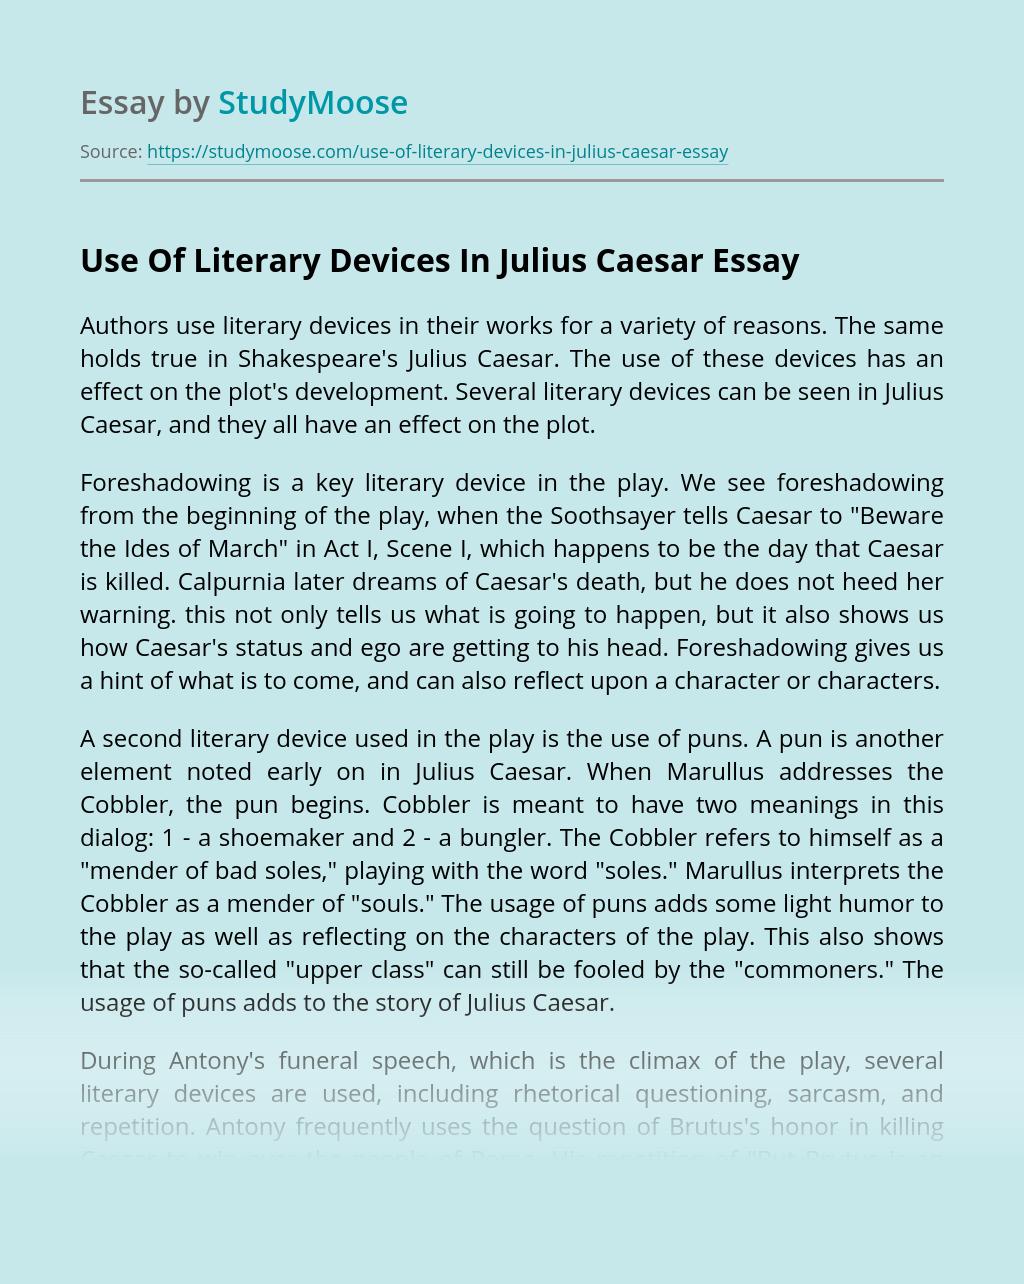 Use Of Literary Devices In Julius Caesar